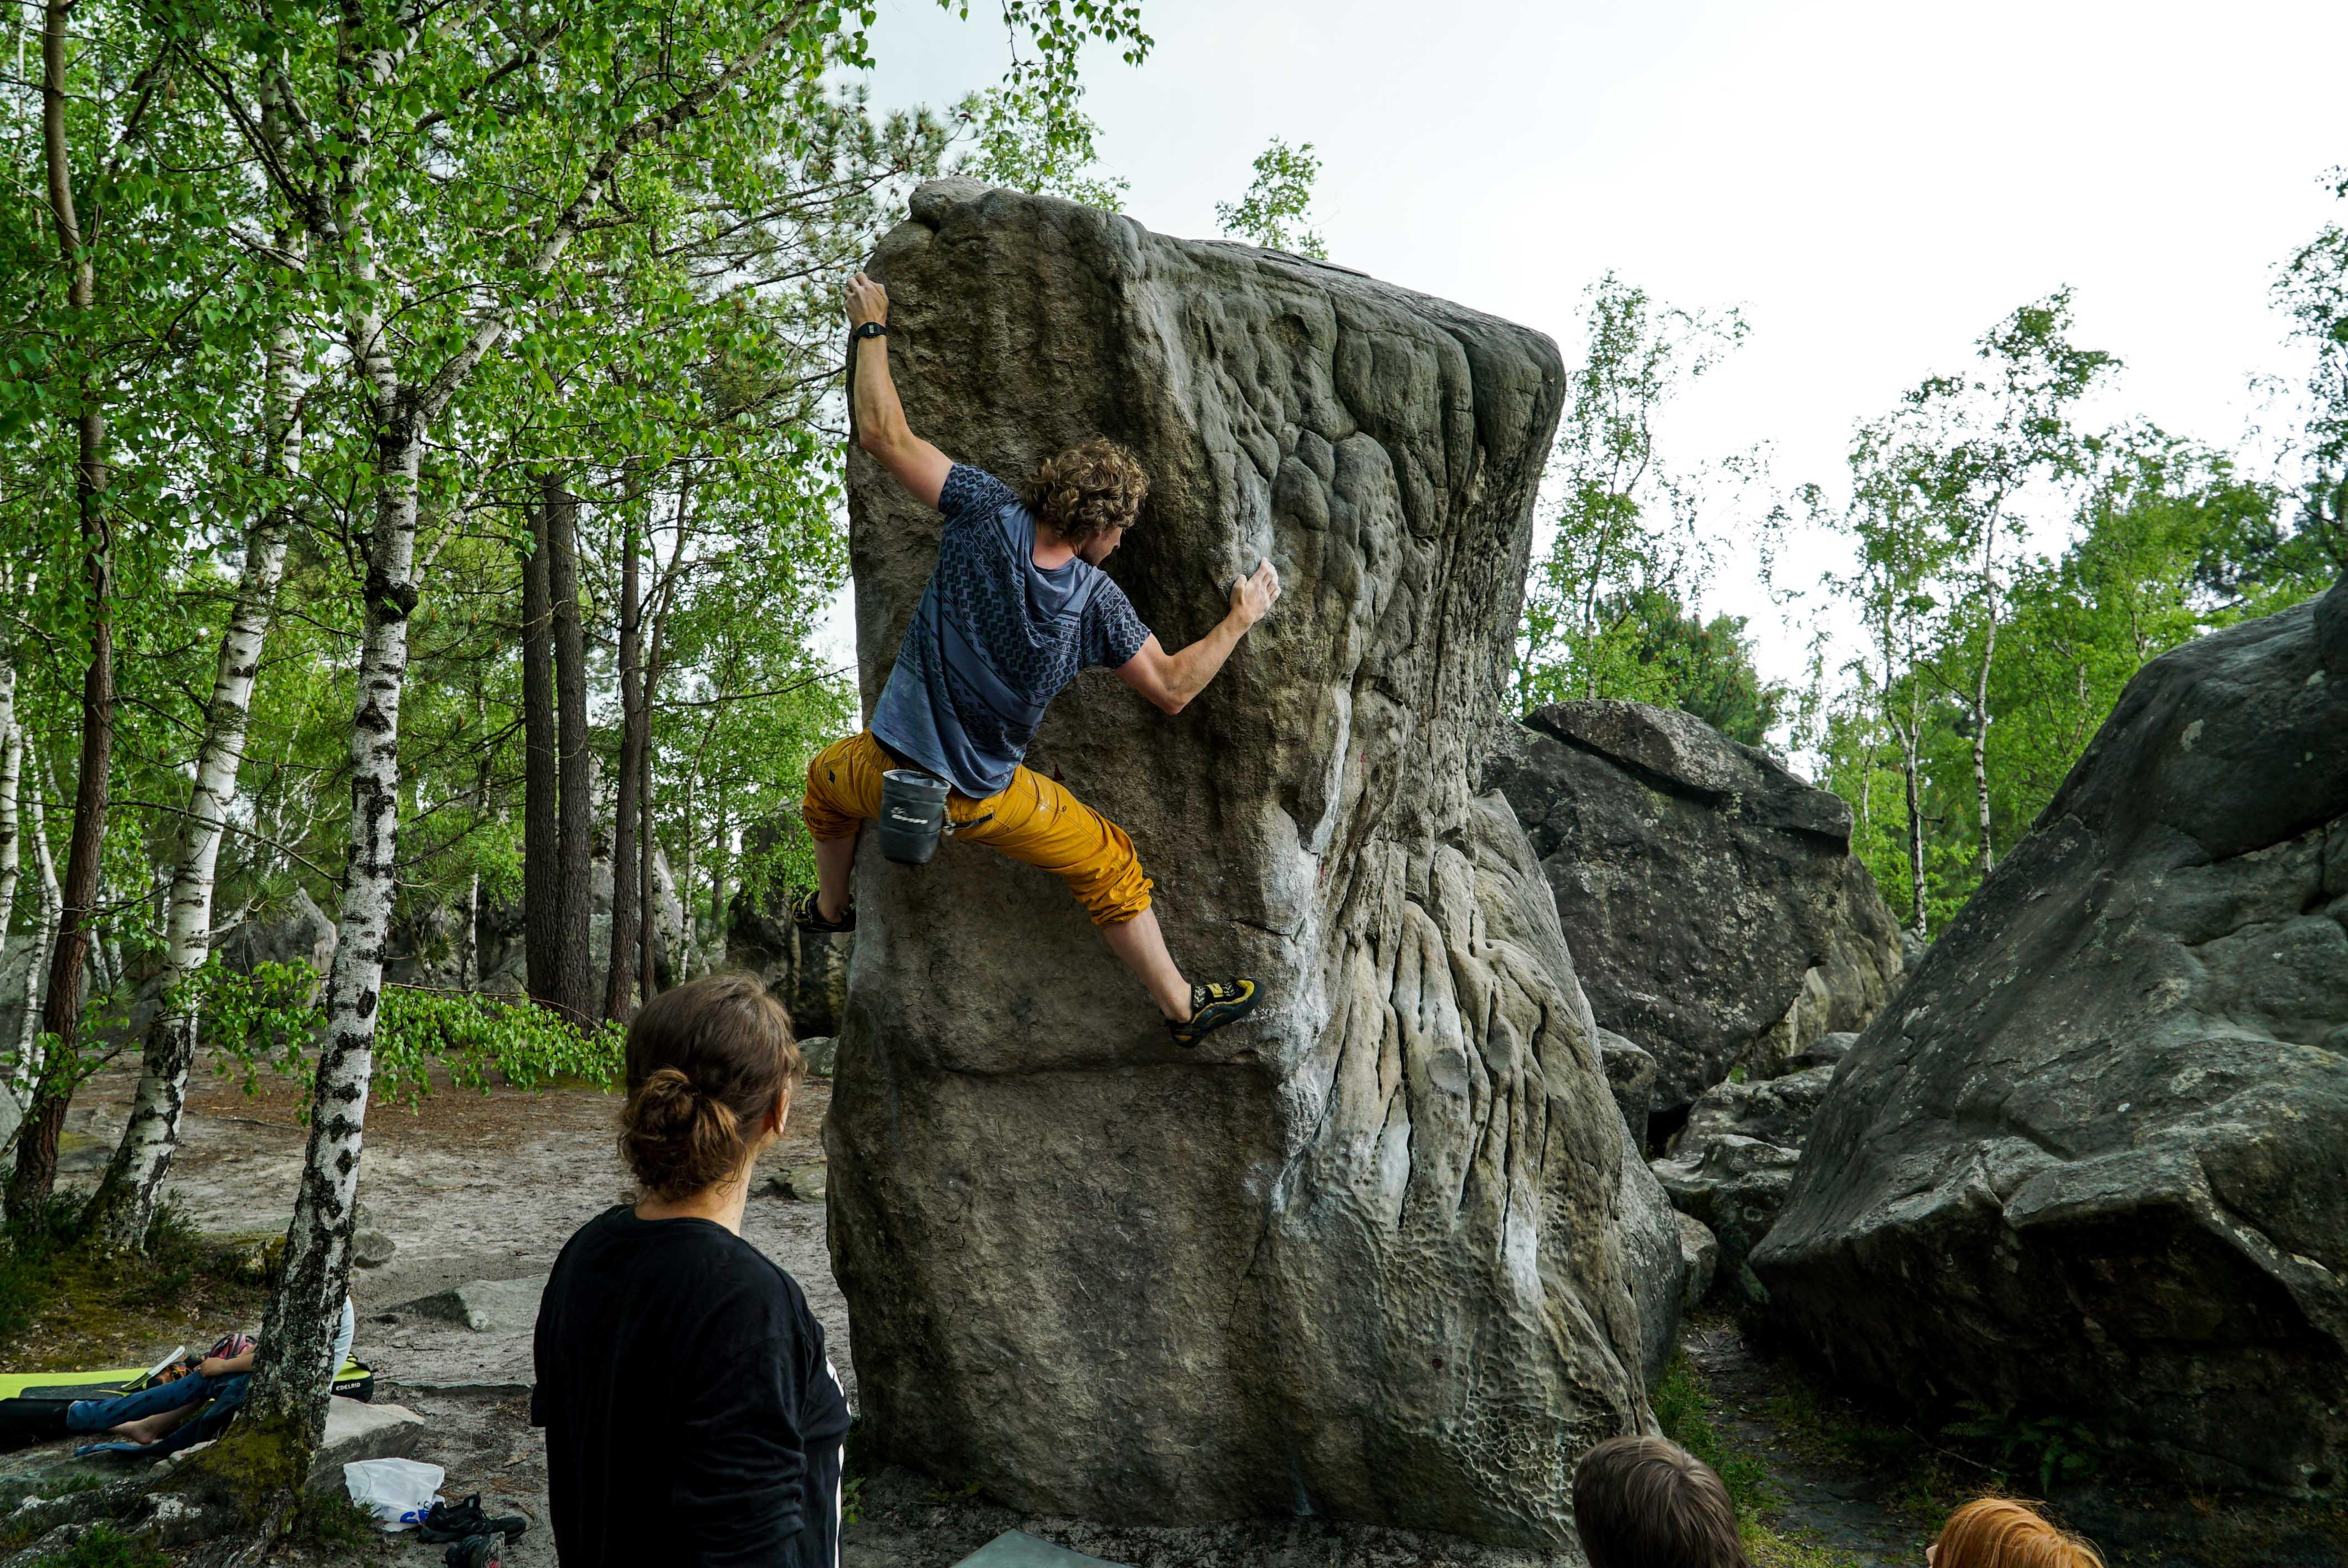 fontainbleau climbing 2016 mike brindley-84